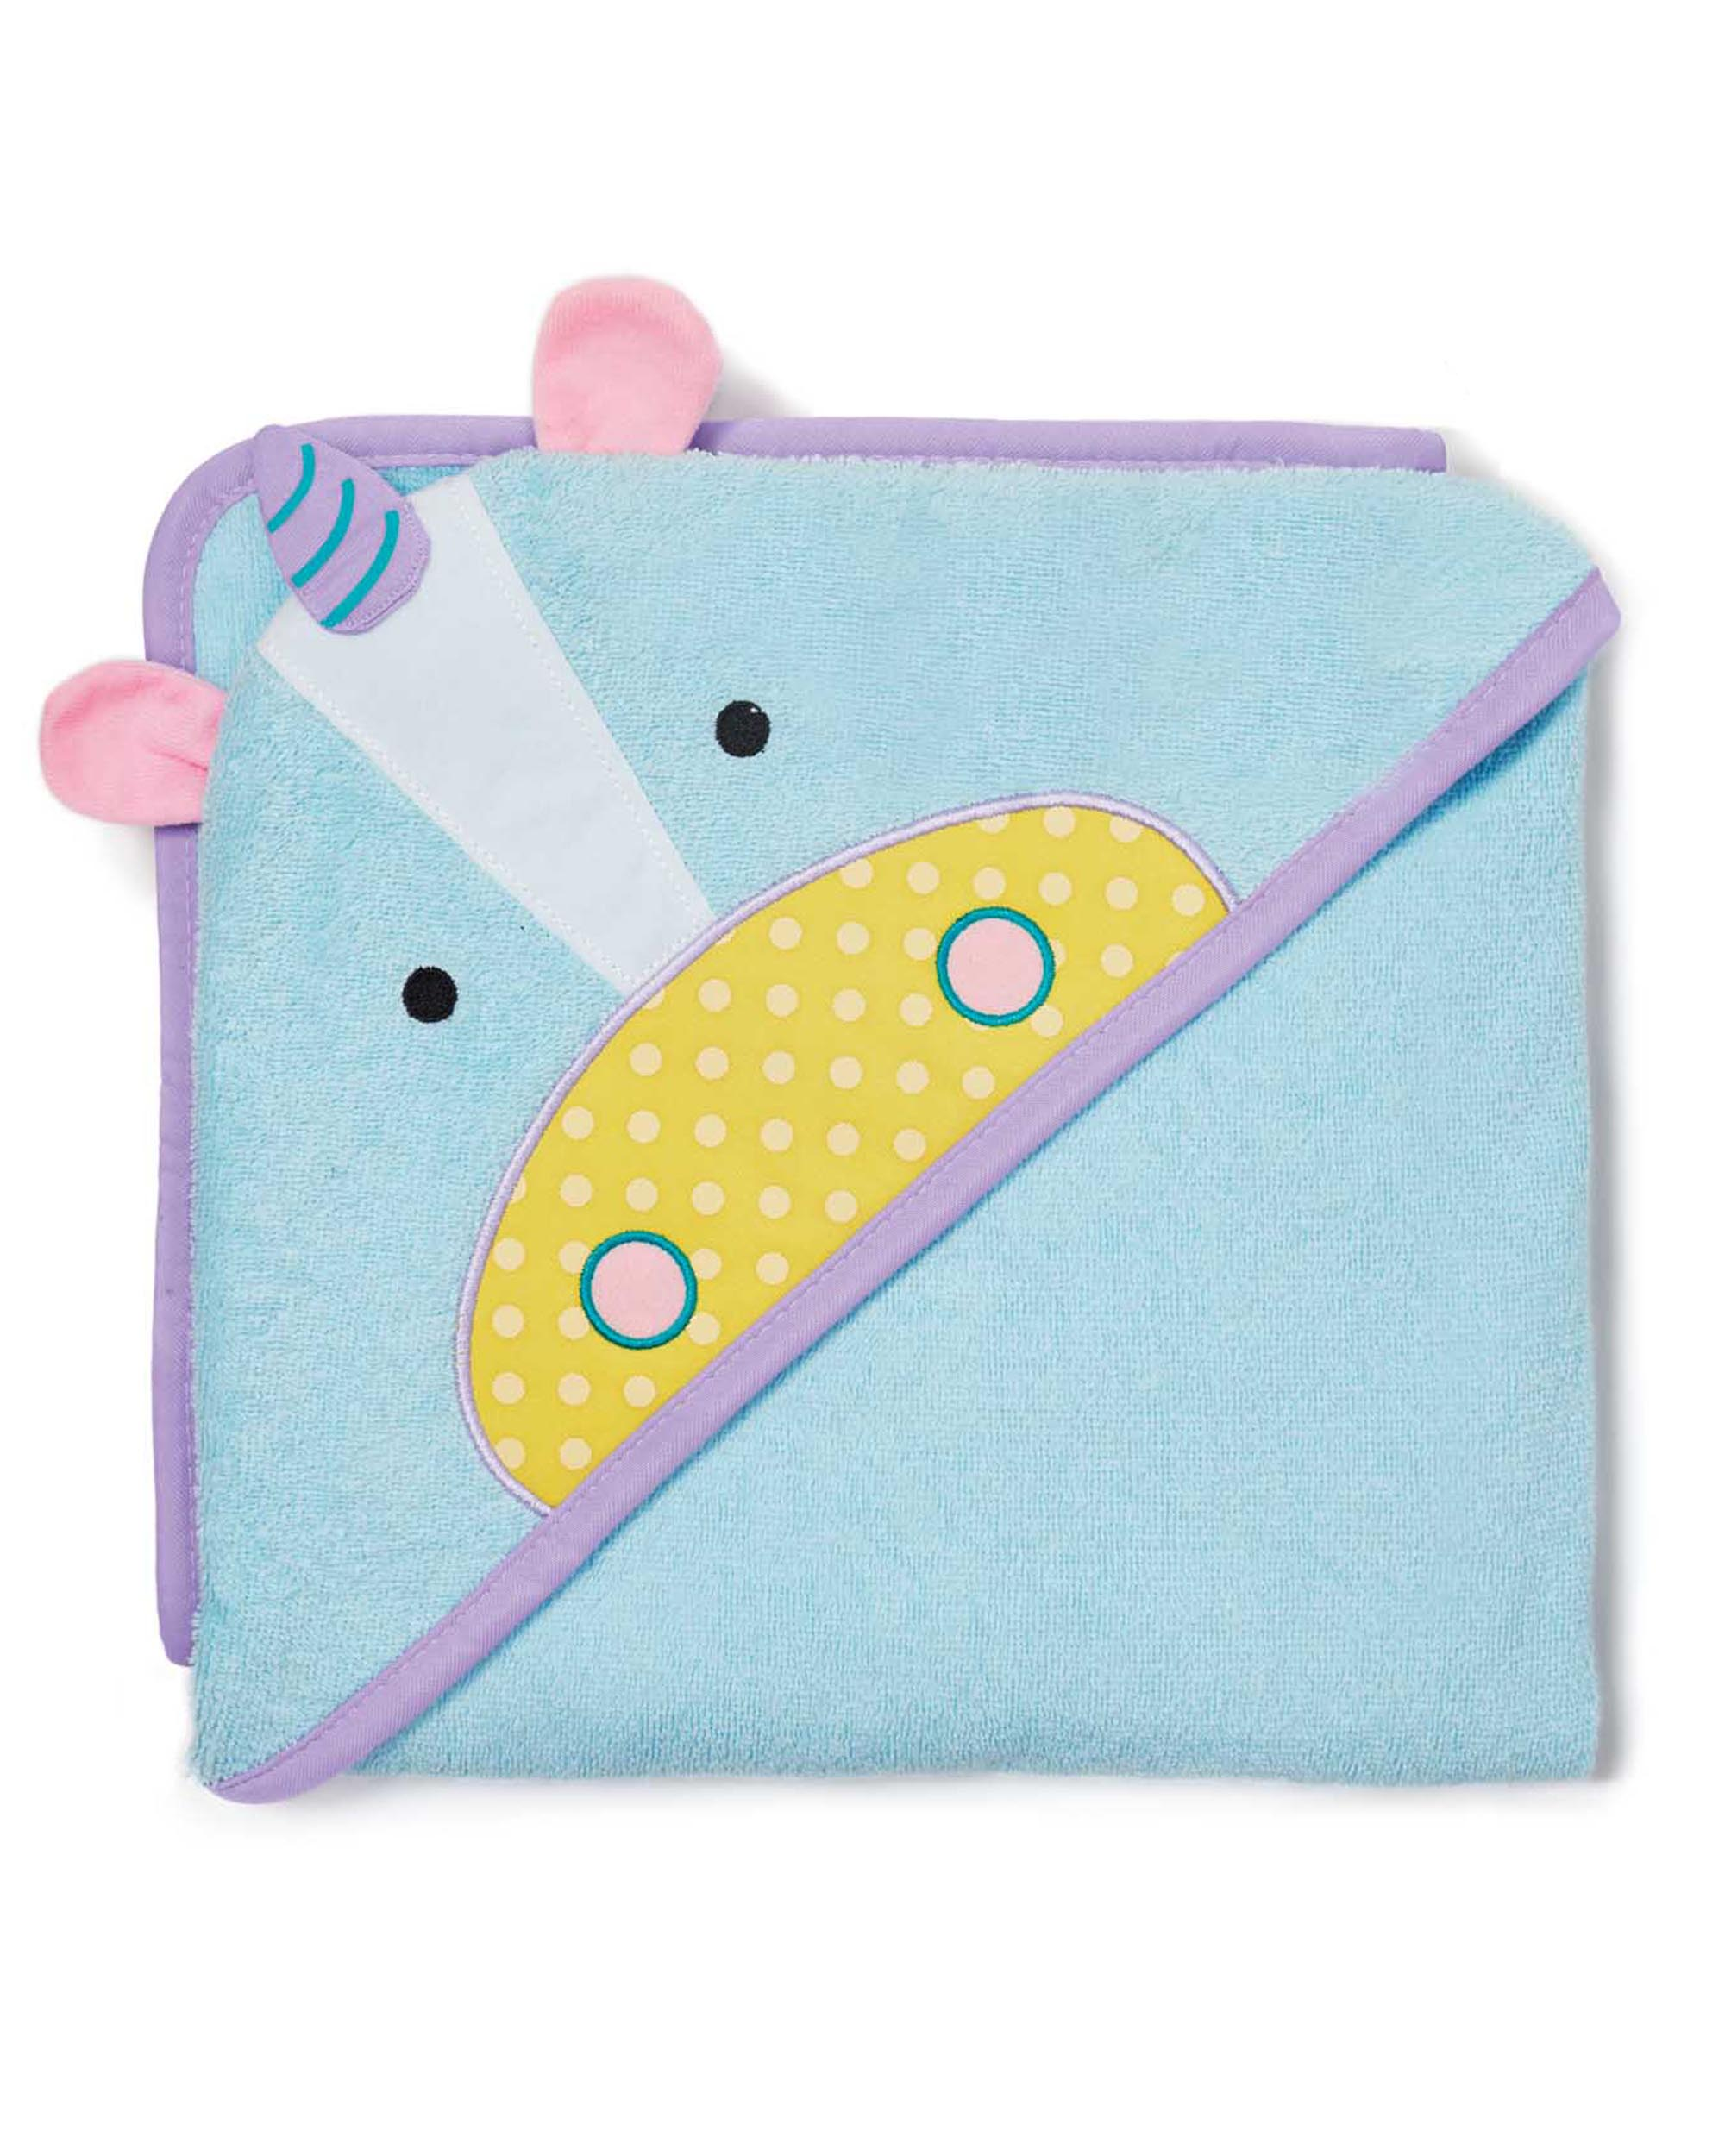 Skip Hop Hooded Towel - Unicorn